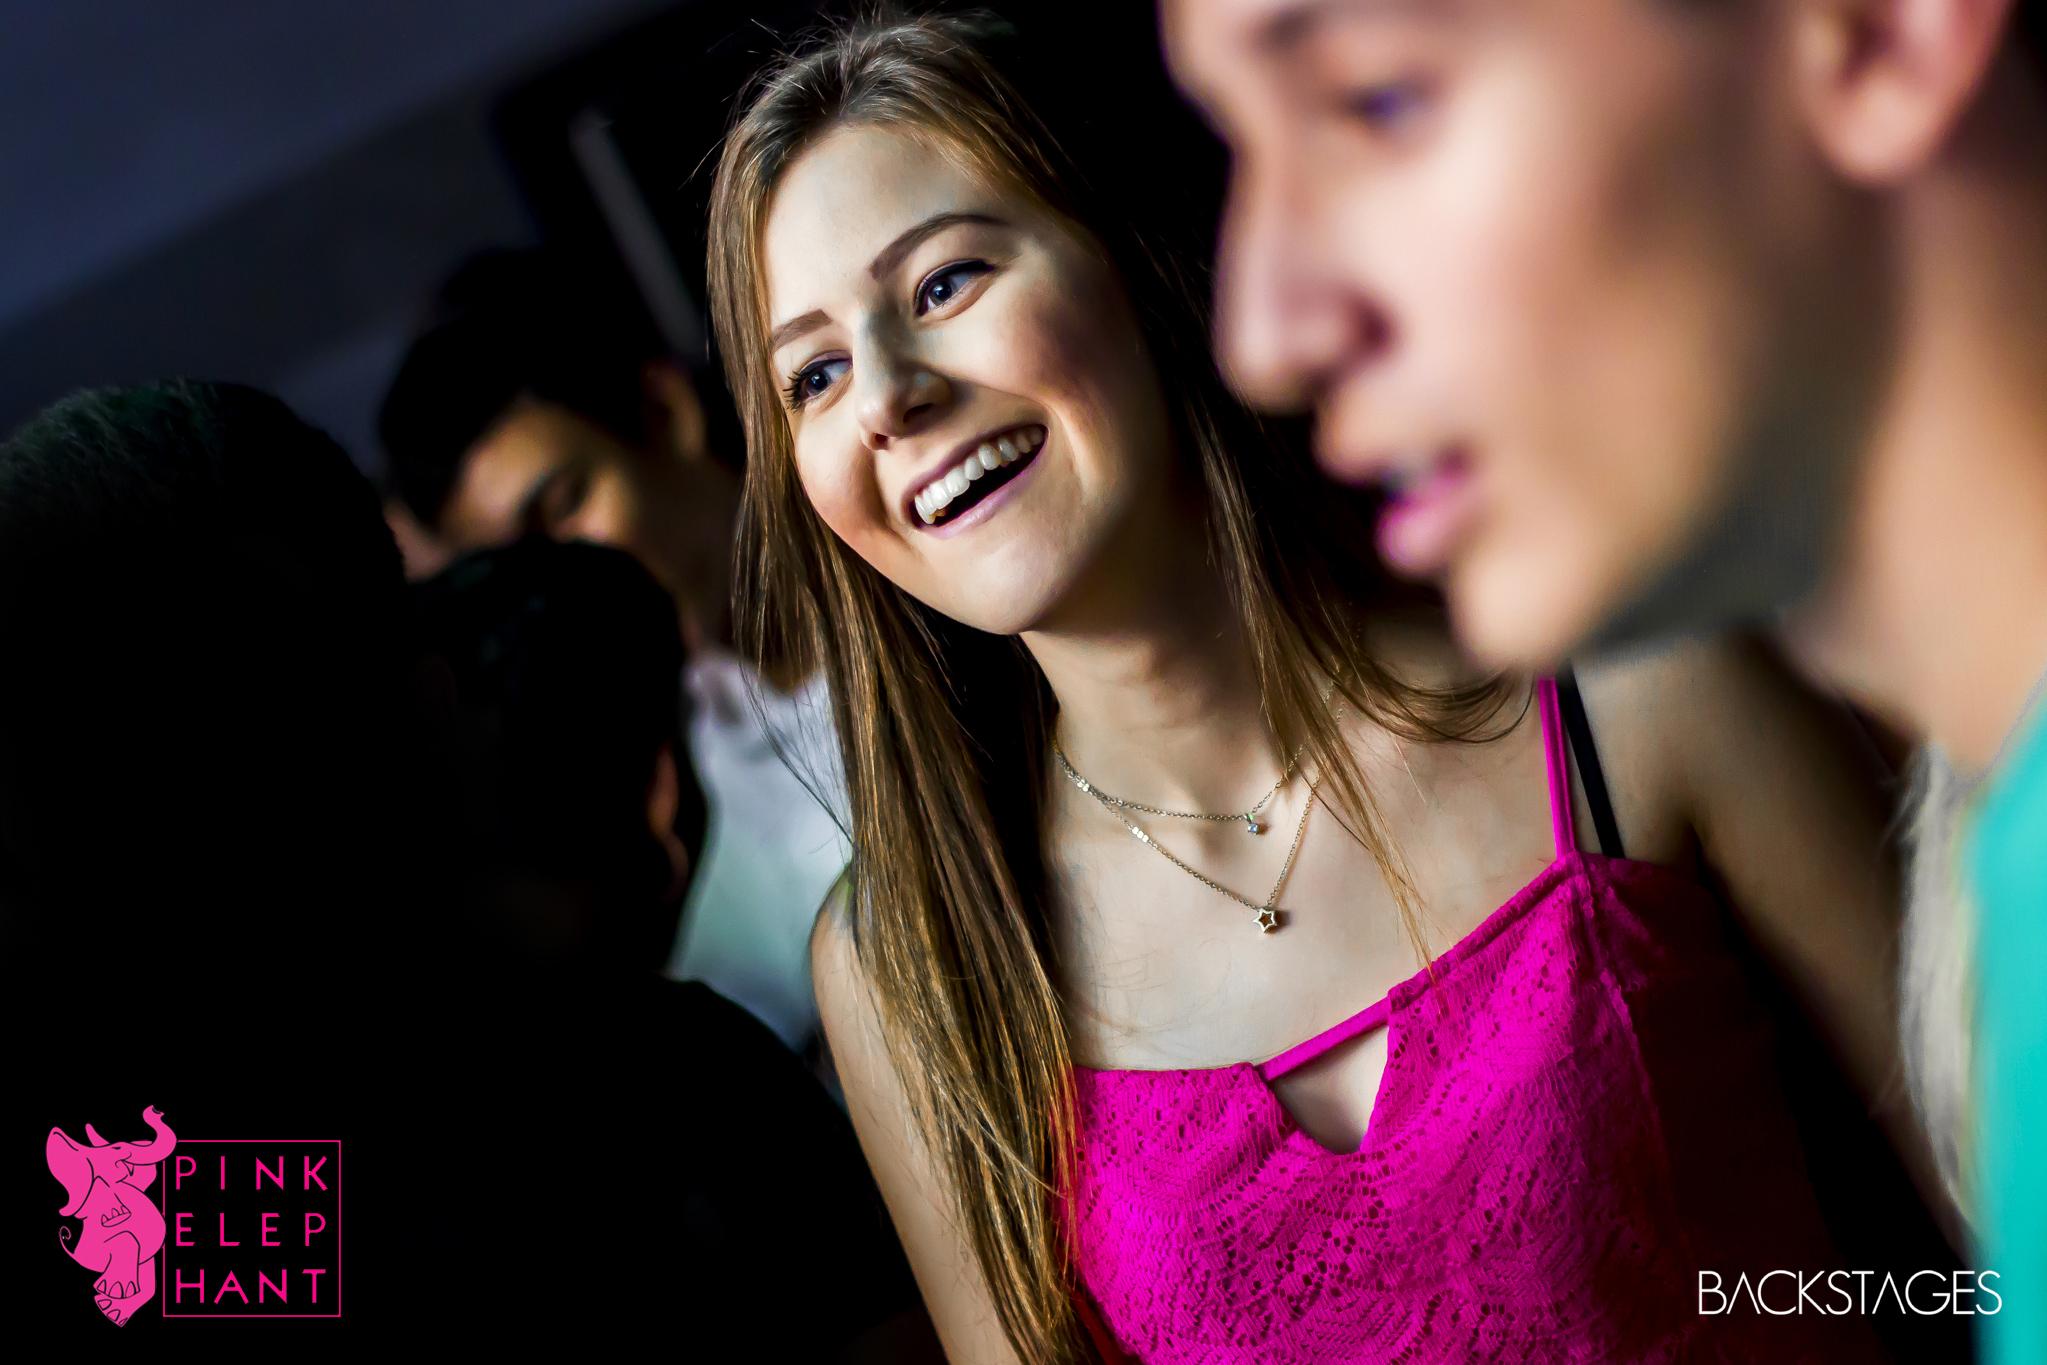 Pink-elephant-club-sorocaba-revista-backstages-foto-kenzi-marinho (8)